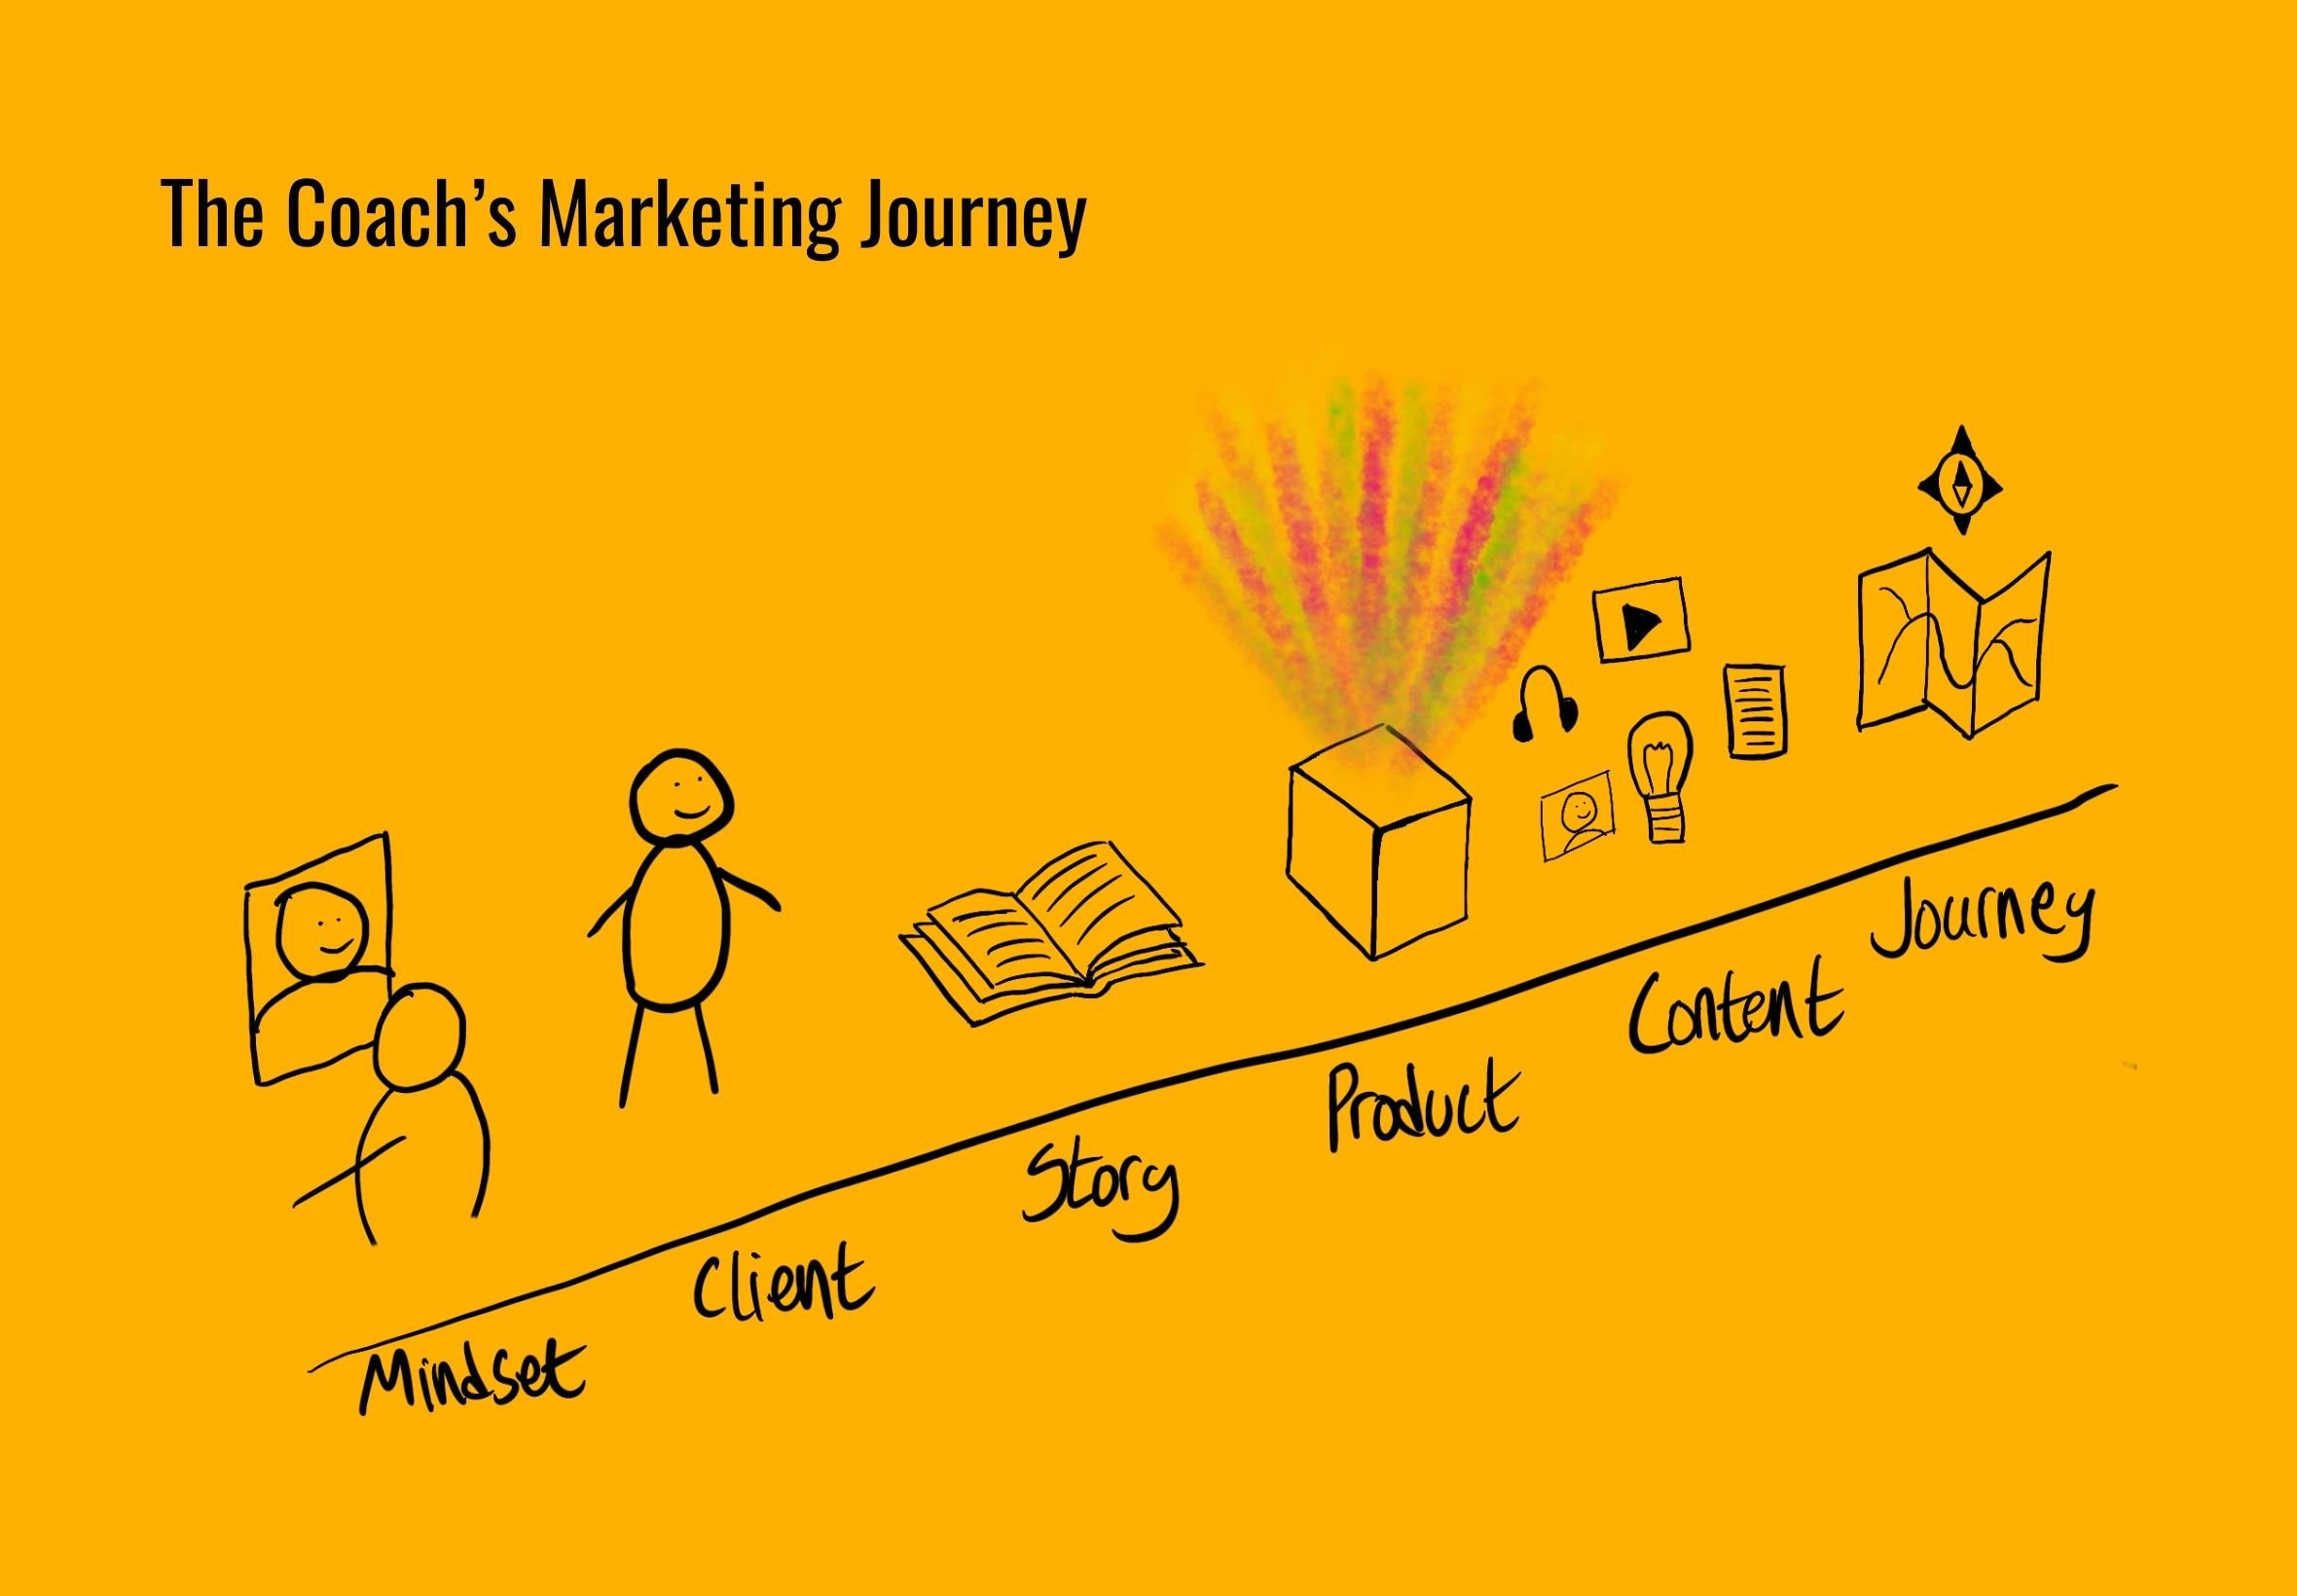 The Coach's Marketing Journey